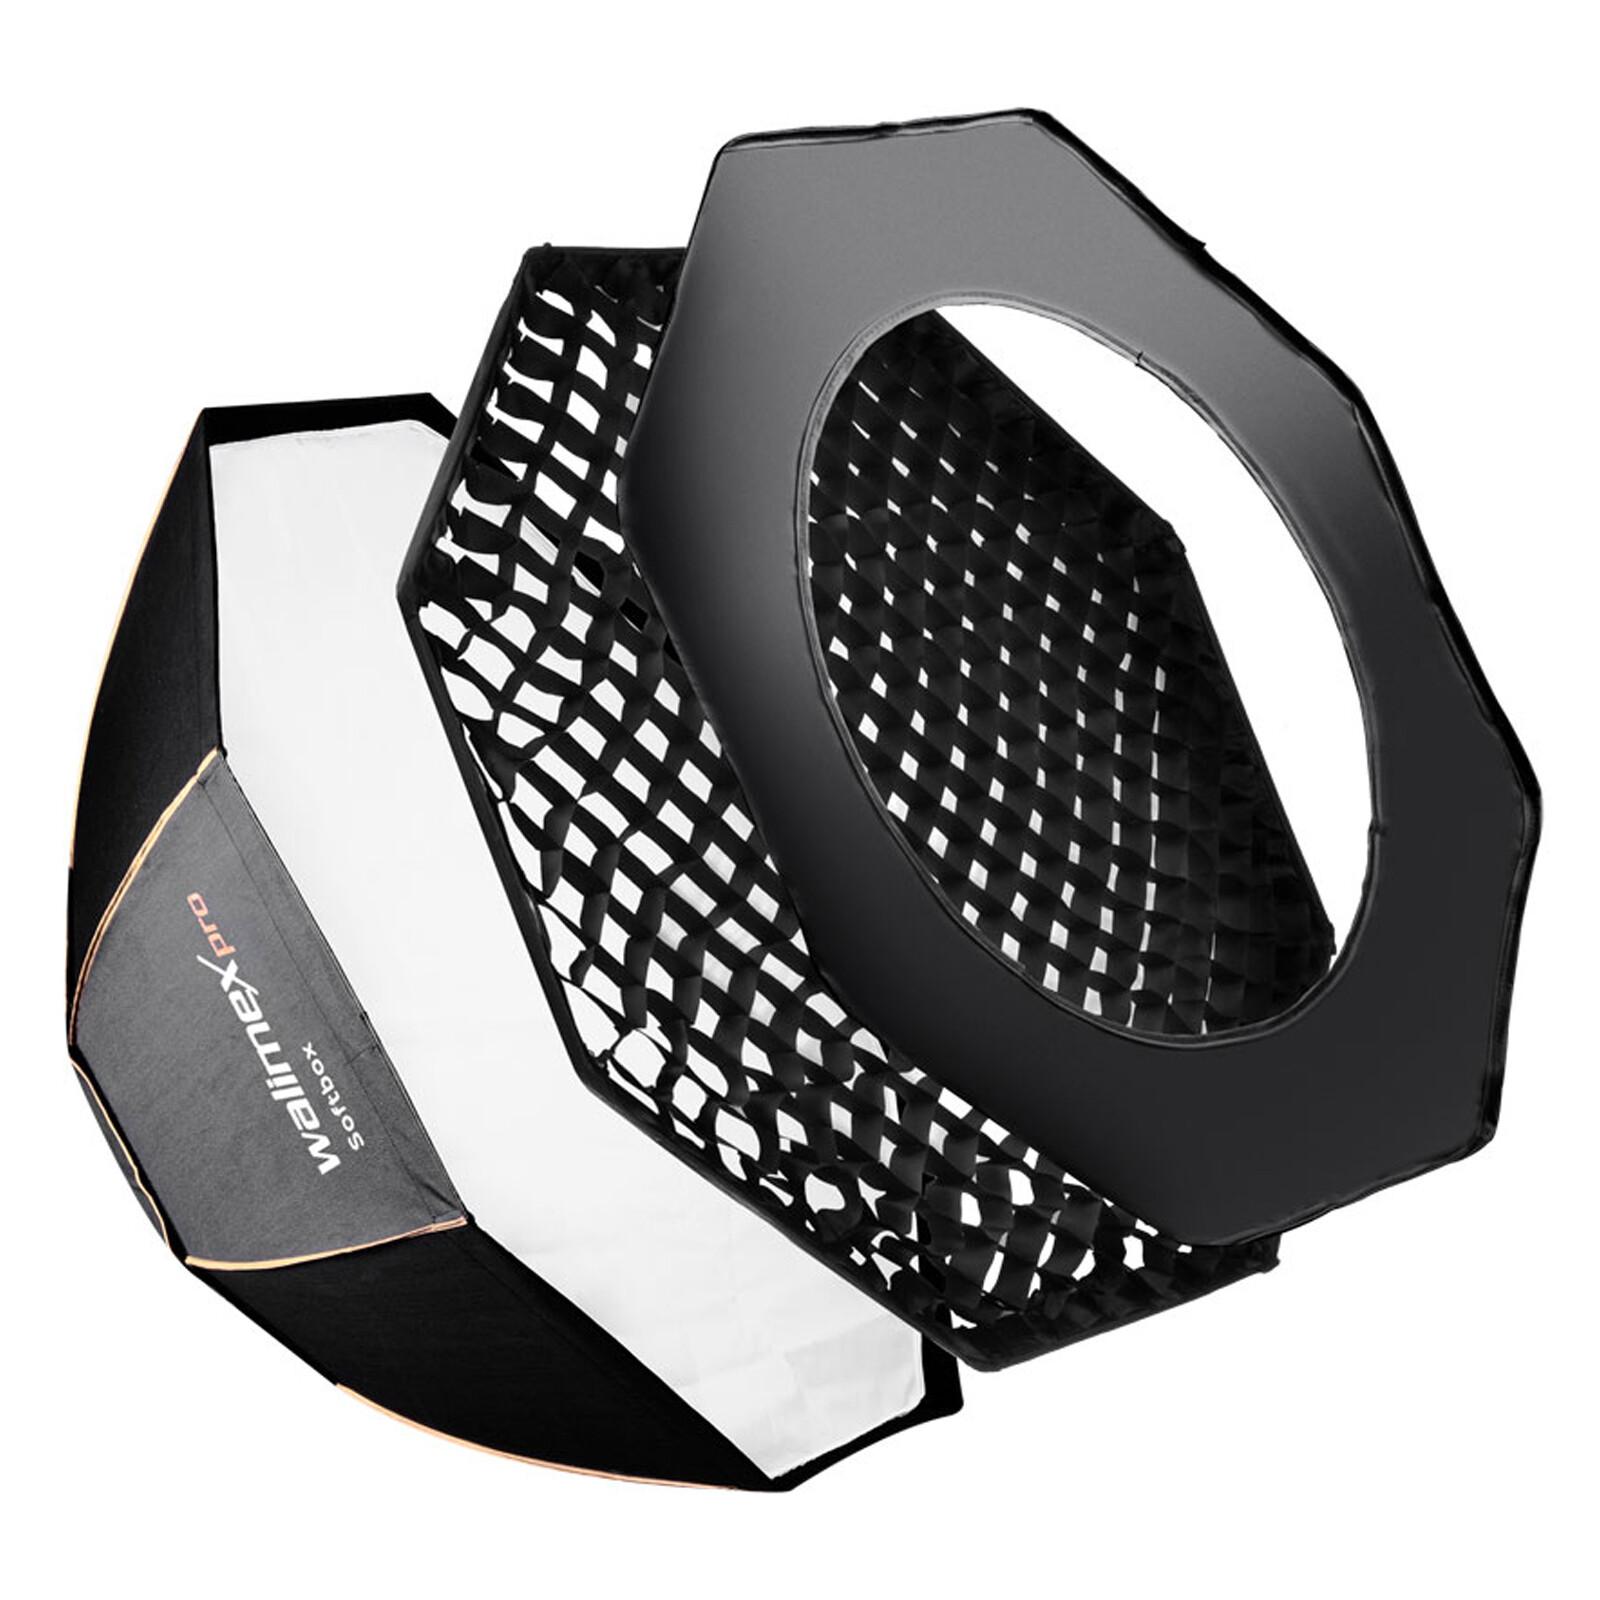 walimex pro Octagon Softbox PLUS OL Ø45 Balcar